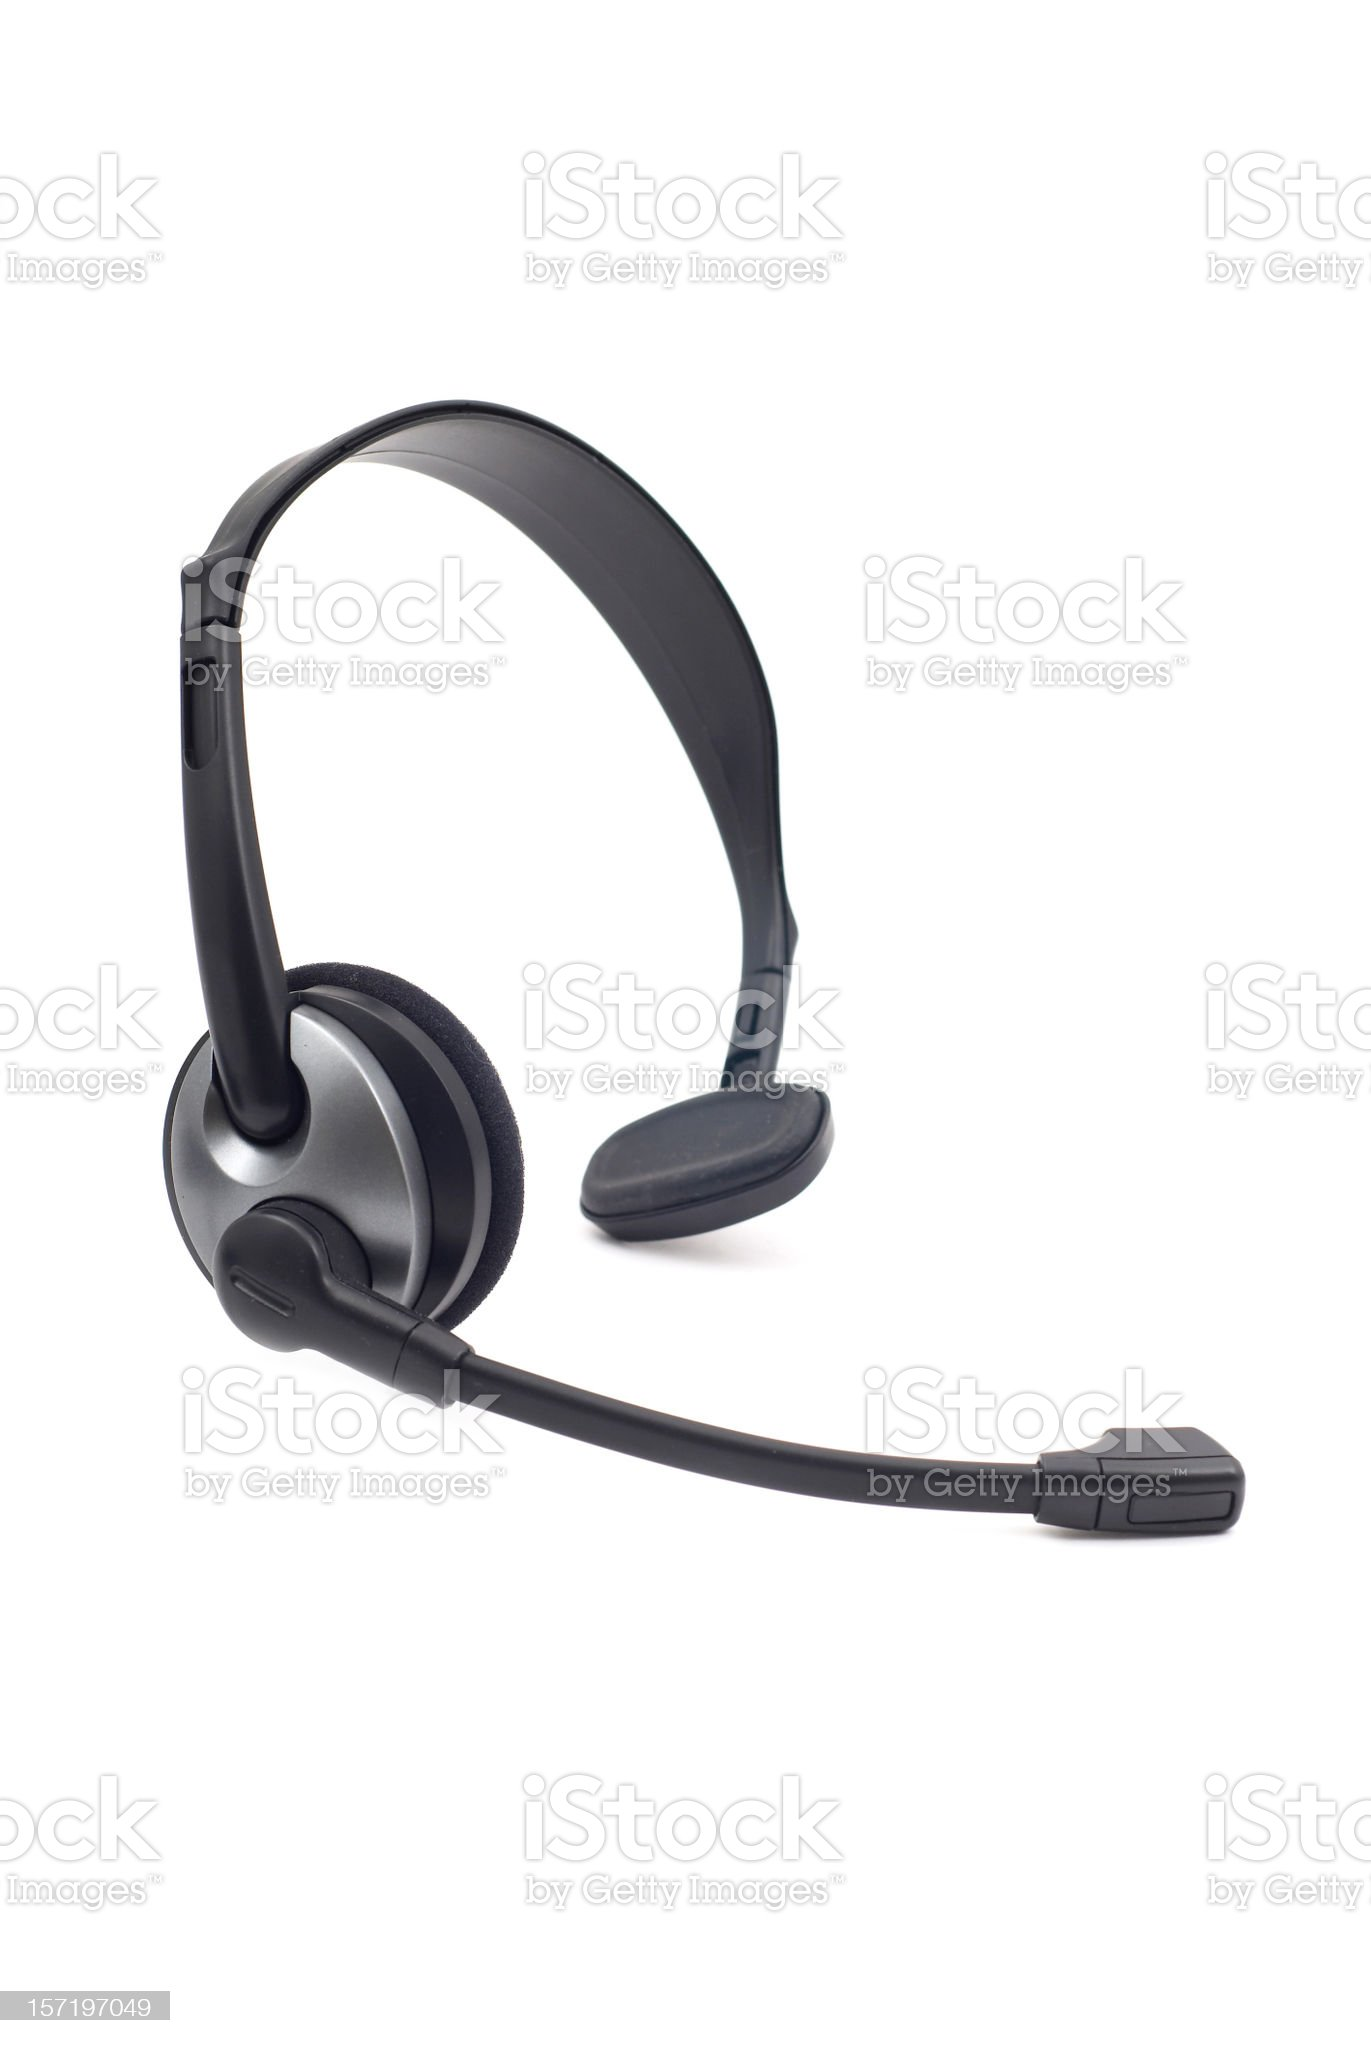 Wireless Headset royalty-free stock photo